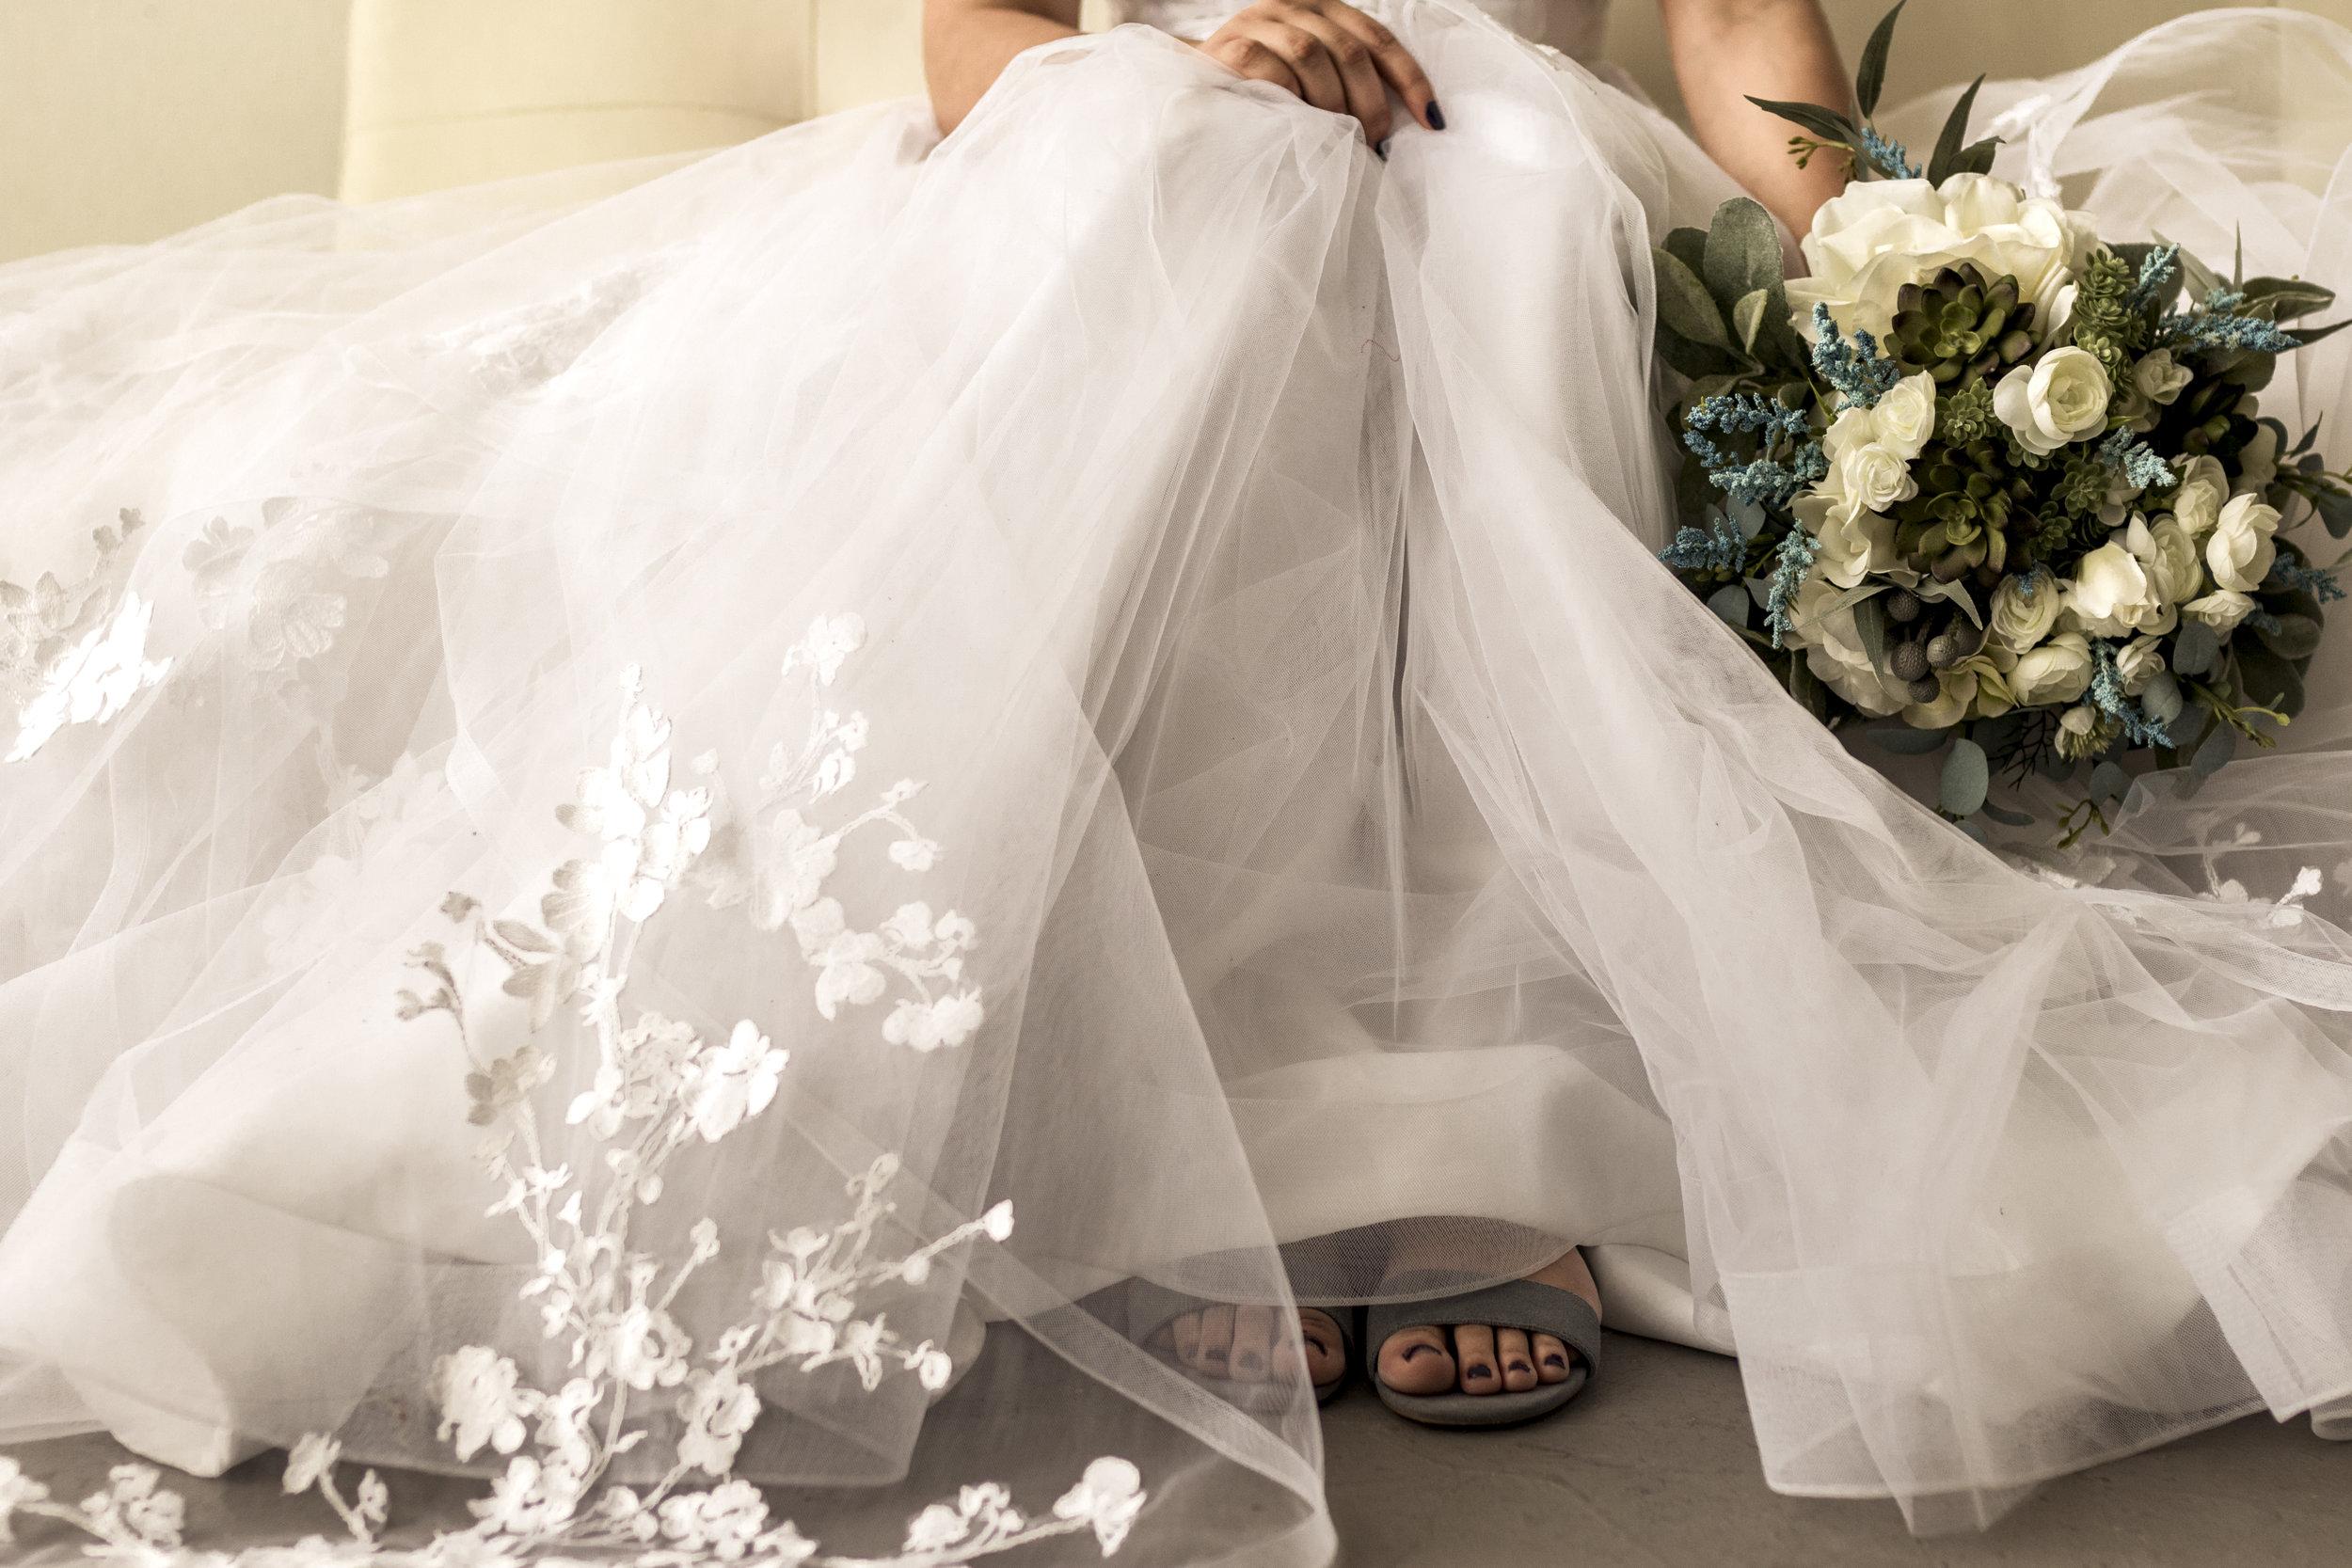 BBPhoto Utah Bridals in studio15.JPG